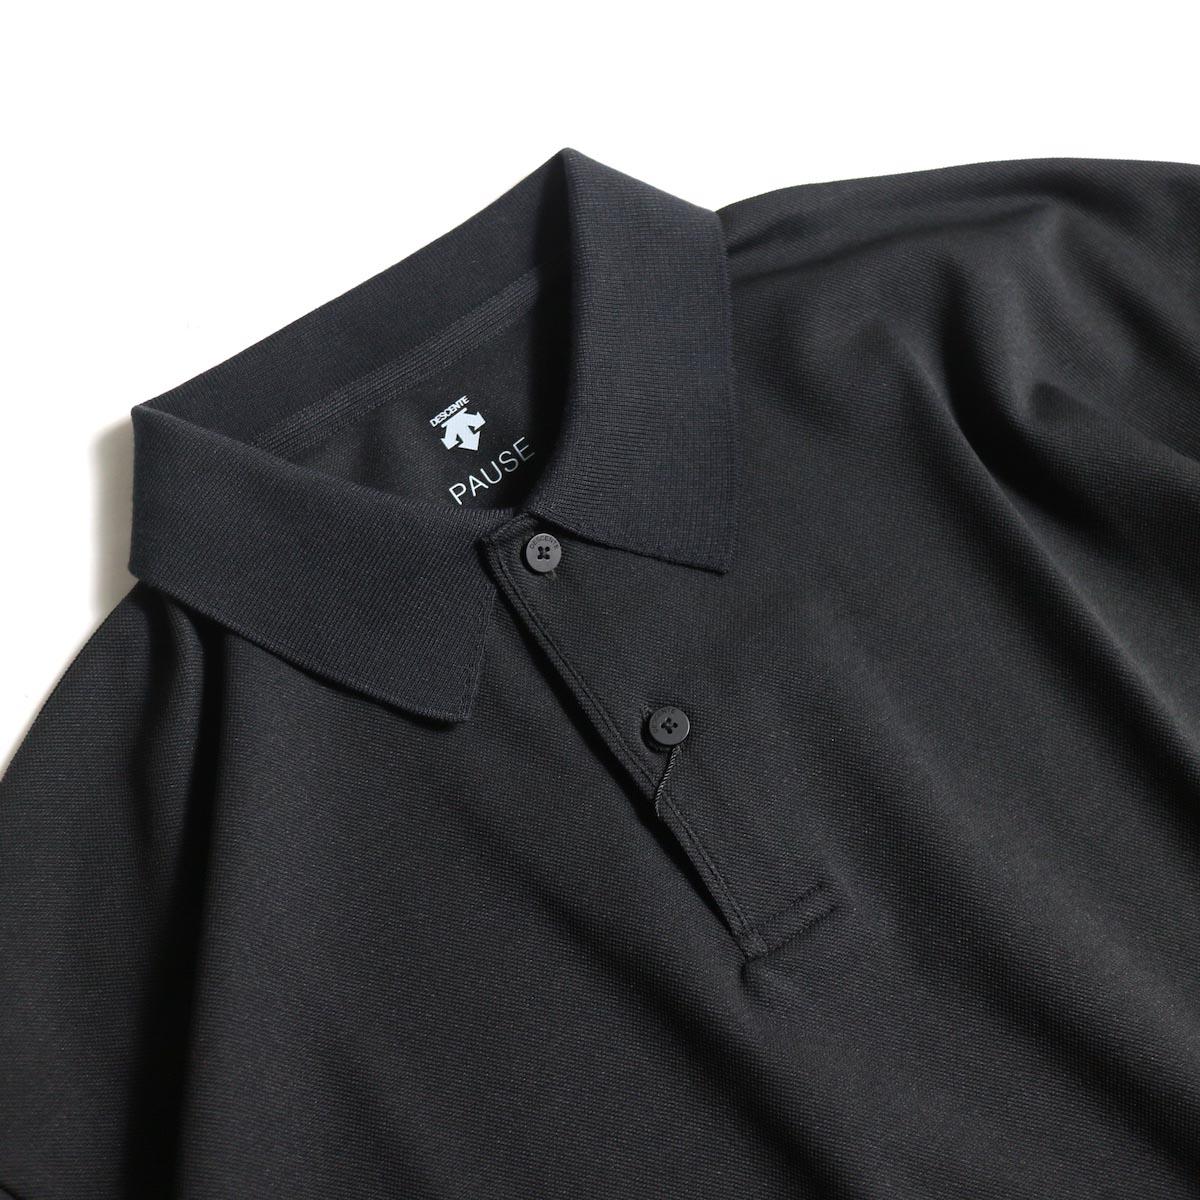 DESCENTE PAUSE / POLO SHIRT (Black)襟